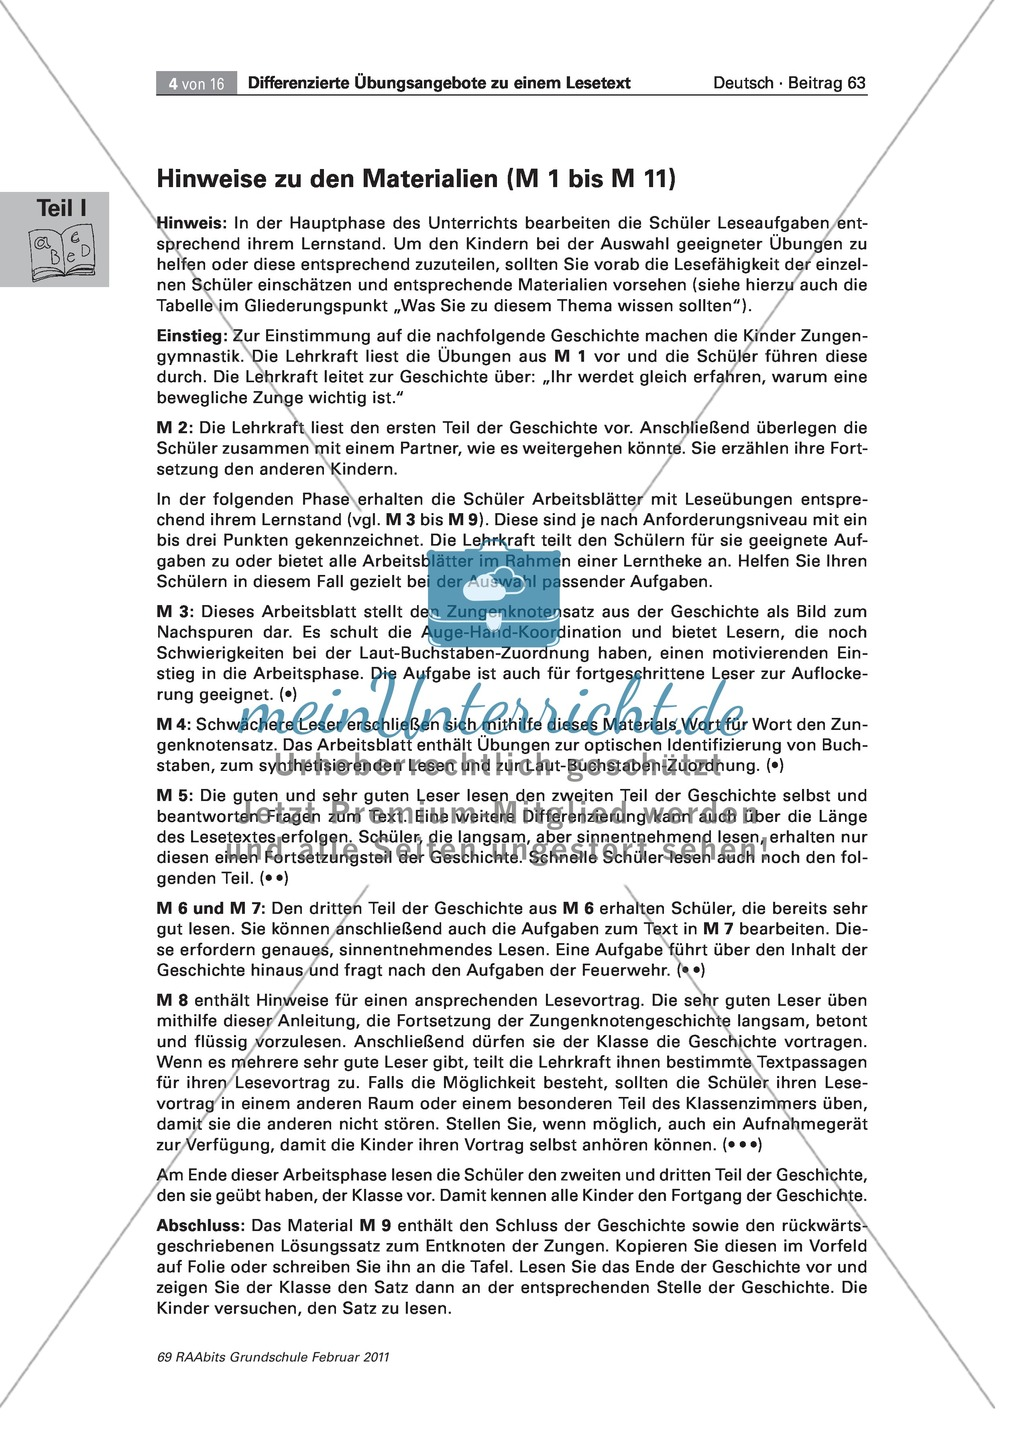 Anleitung zur Zungengymnastik Preview 0